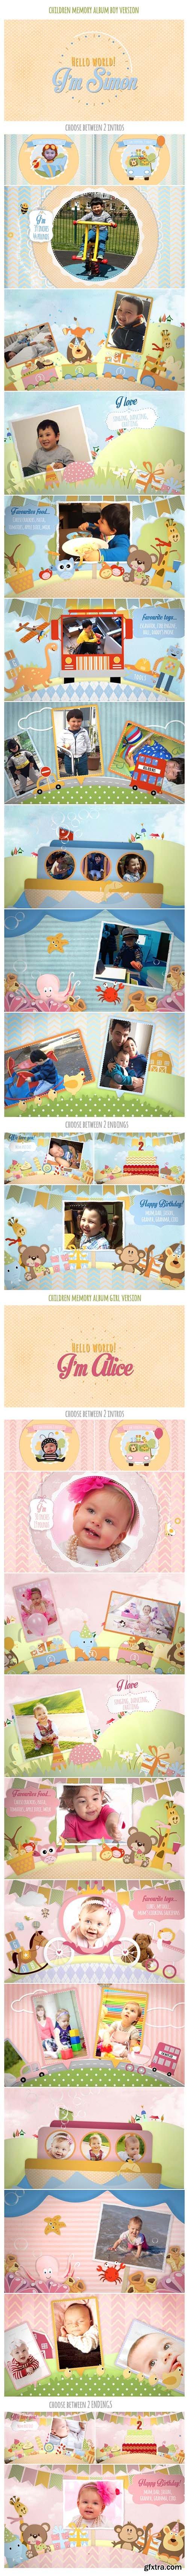 Videohive Children Memory Album And Birthday Invitation 11356837